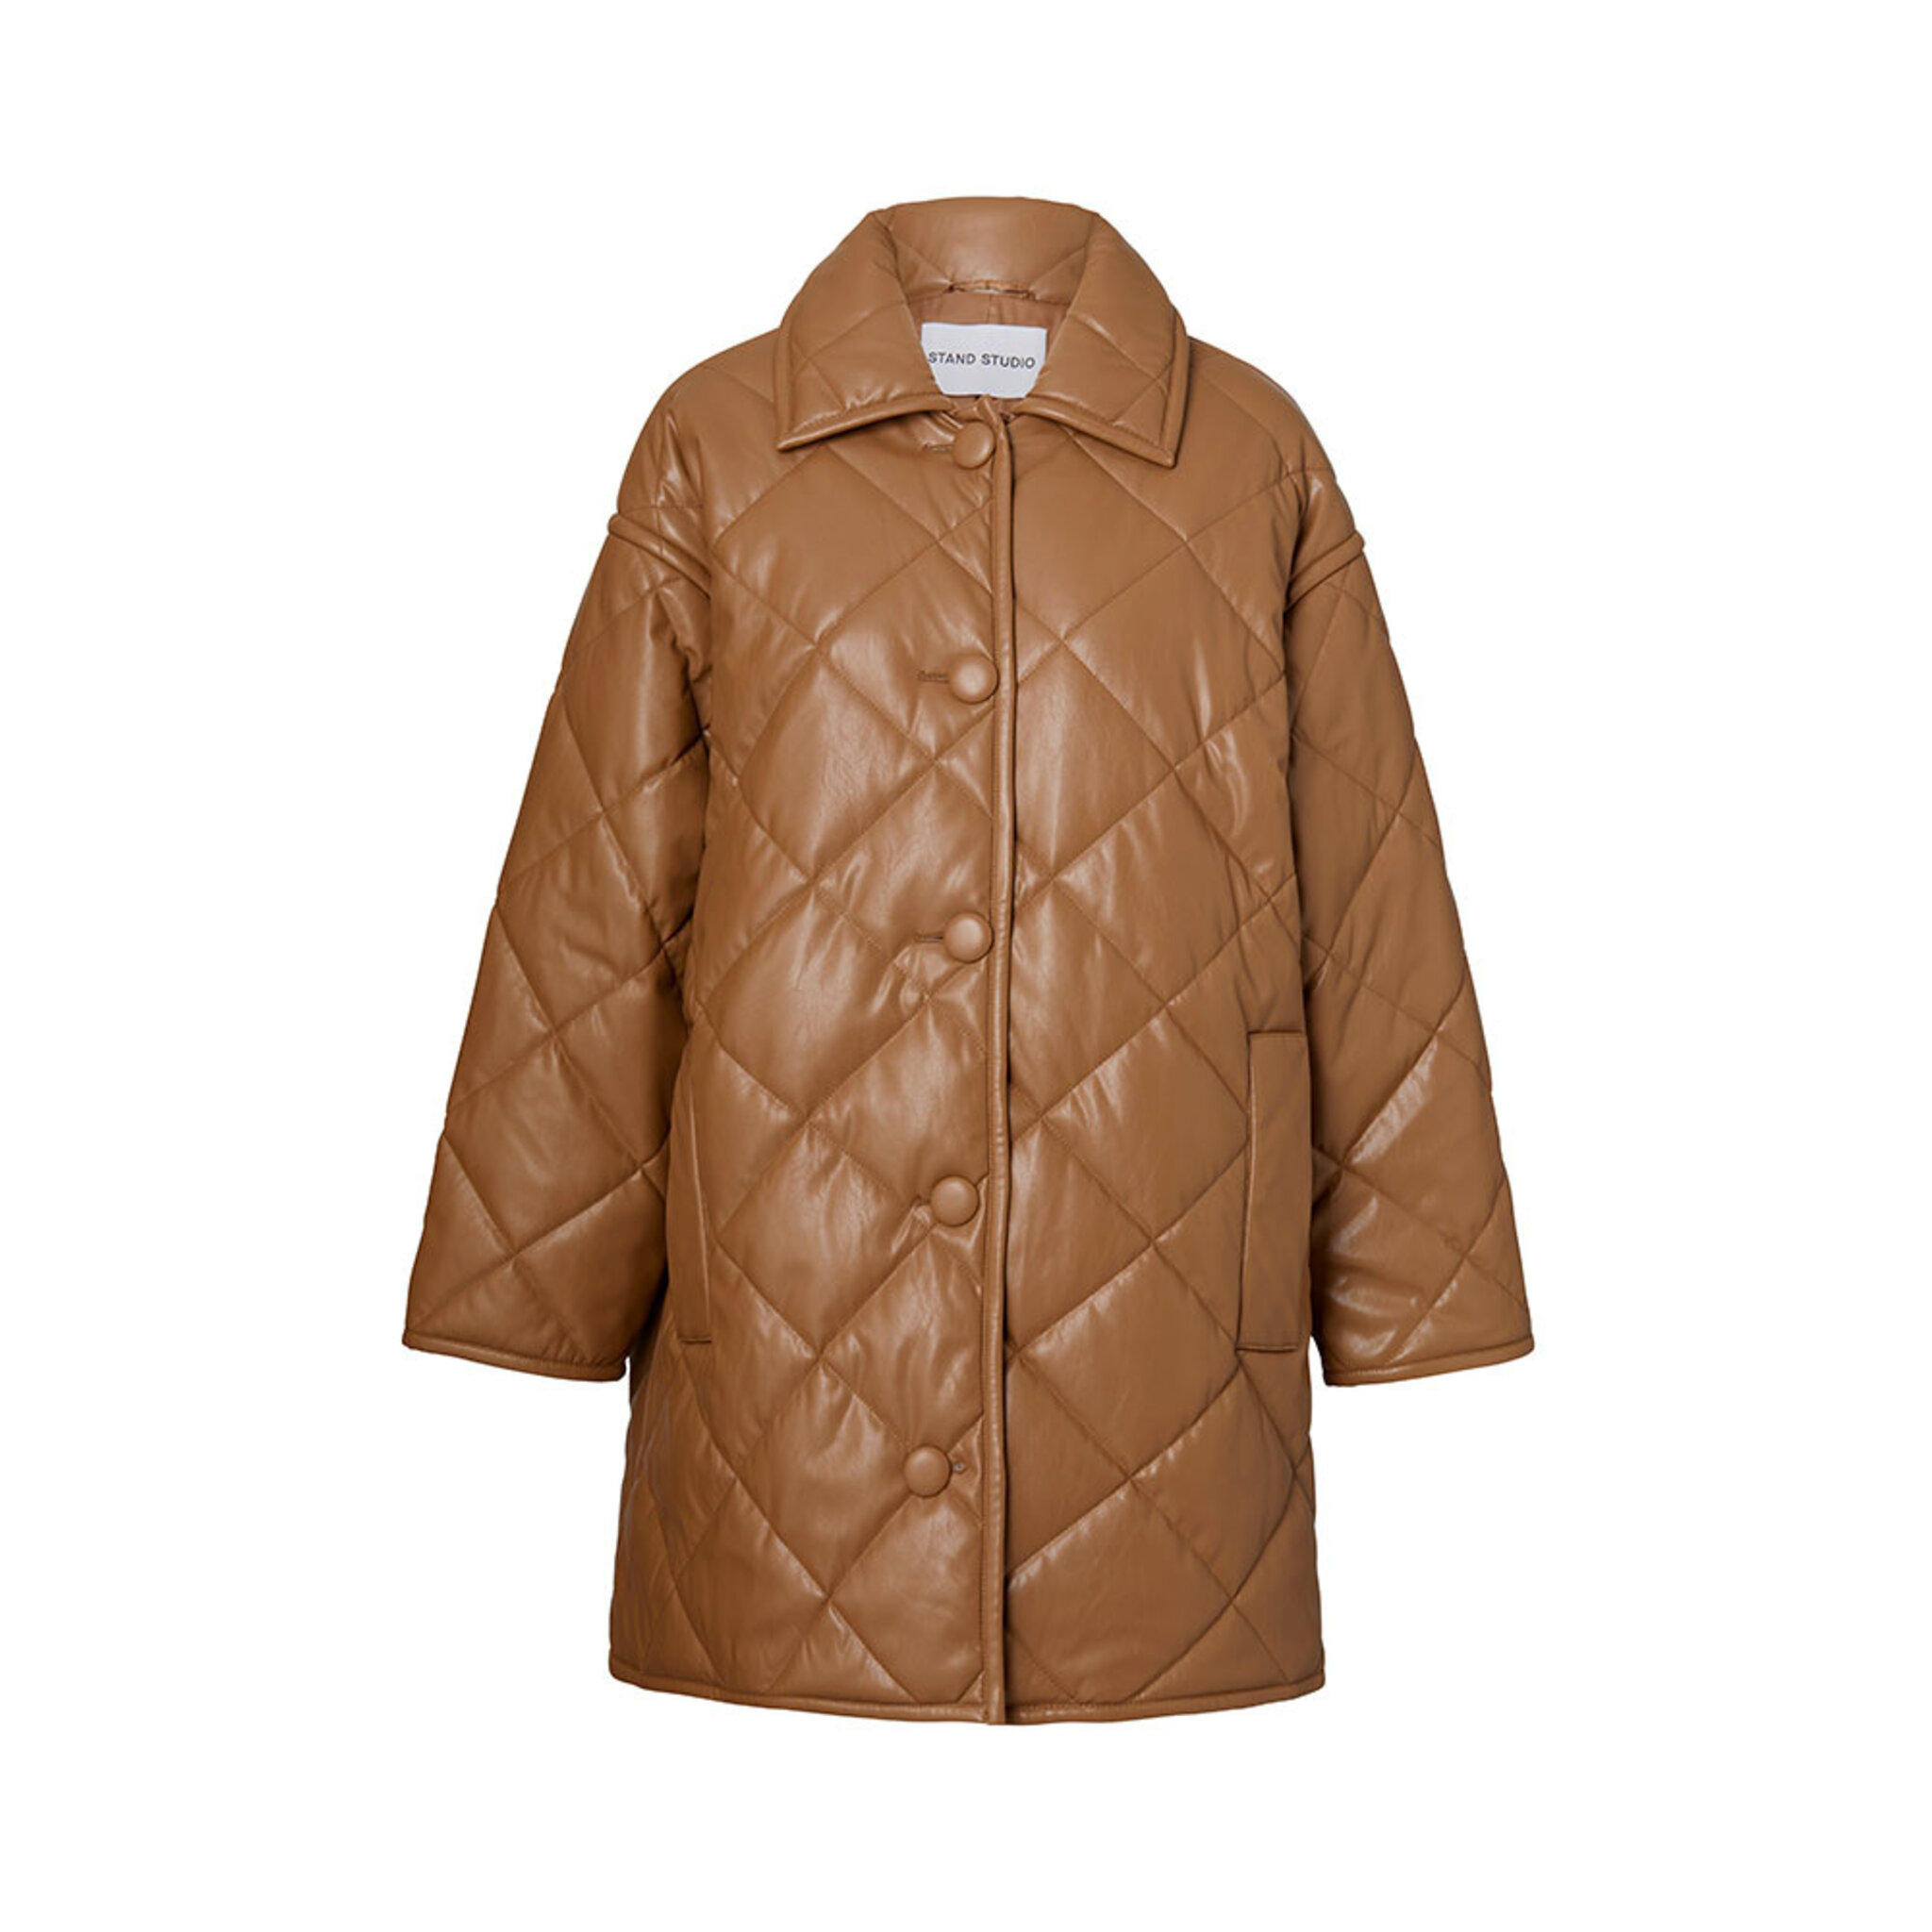 Jacey Puffy Jacket